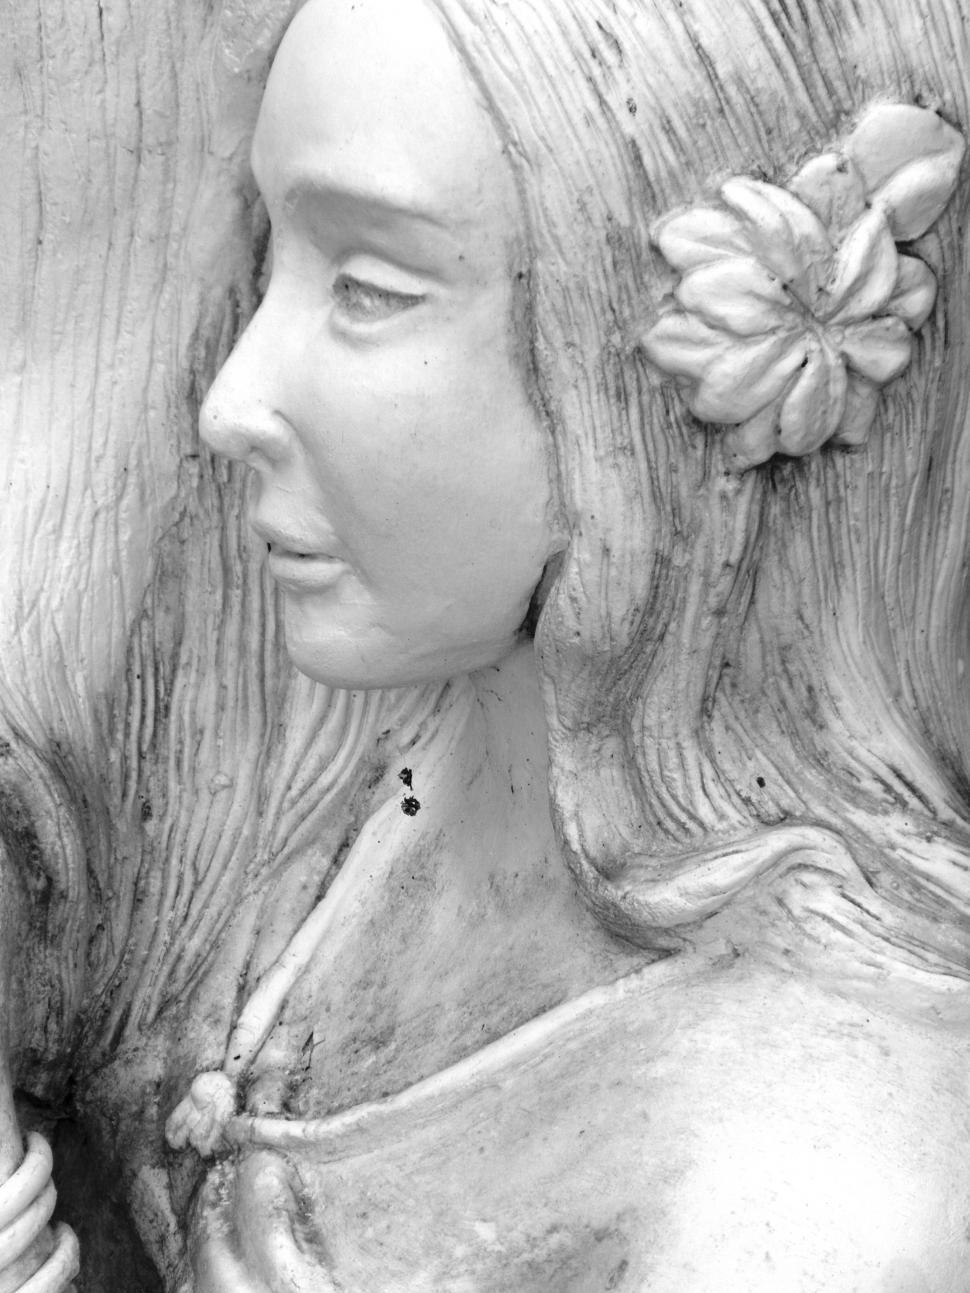 Download Free Stock HD Photo of Oriental Statue of Women Online